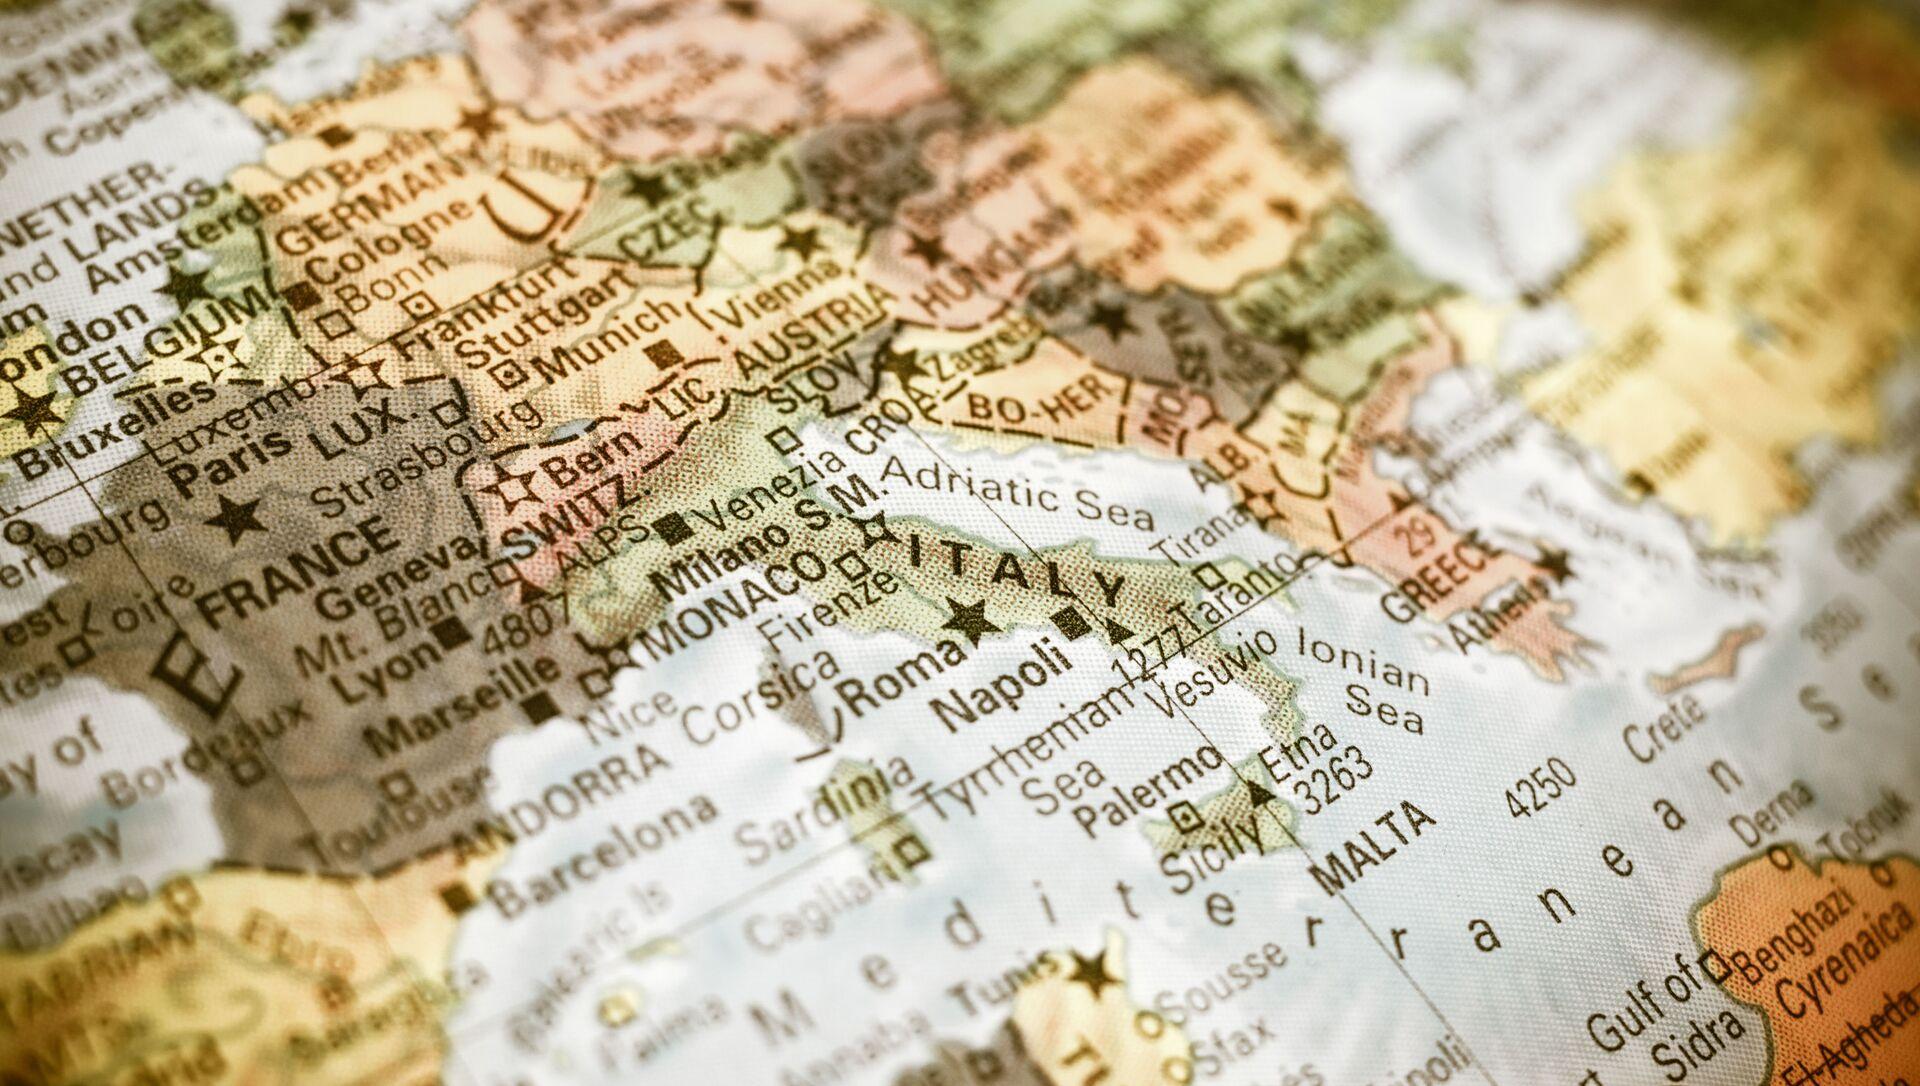 La mappa del Mediterraneo - Sputnik Italia, 1920, 11.02.2021